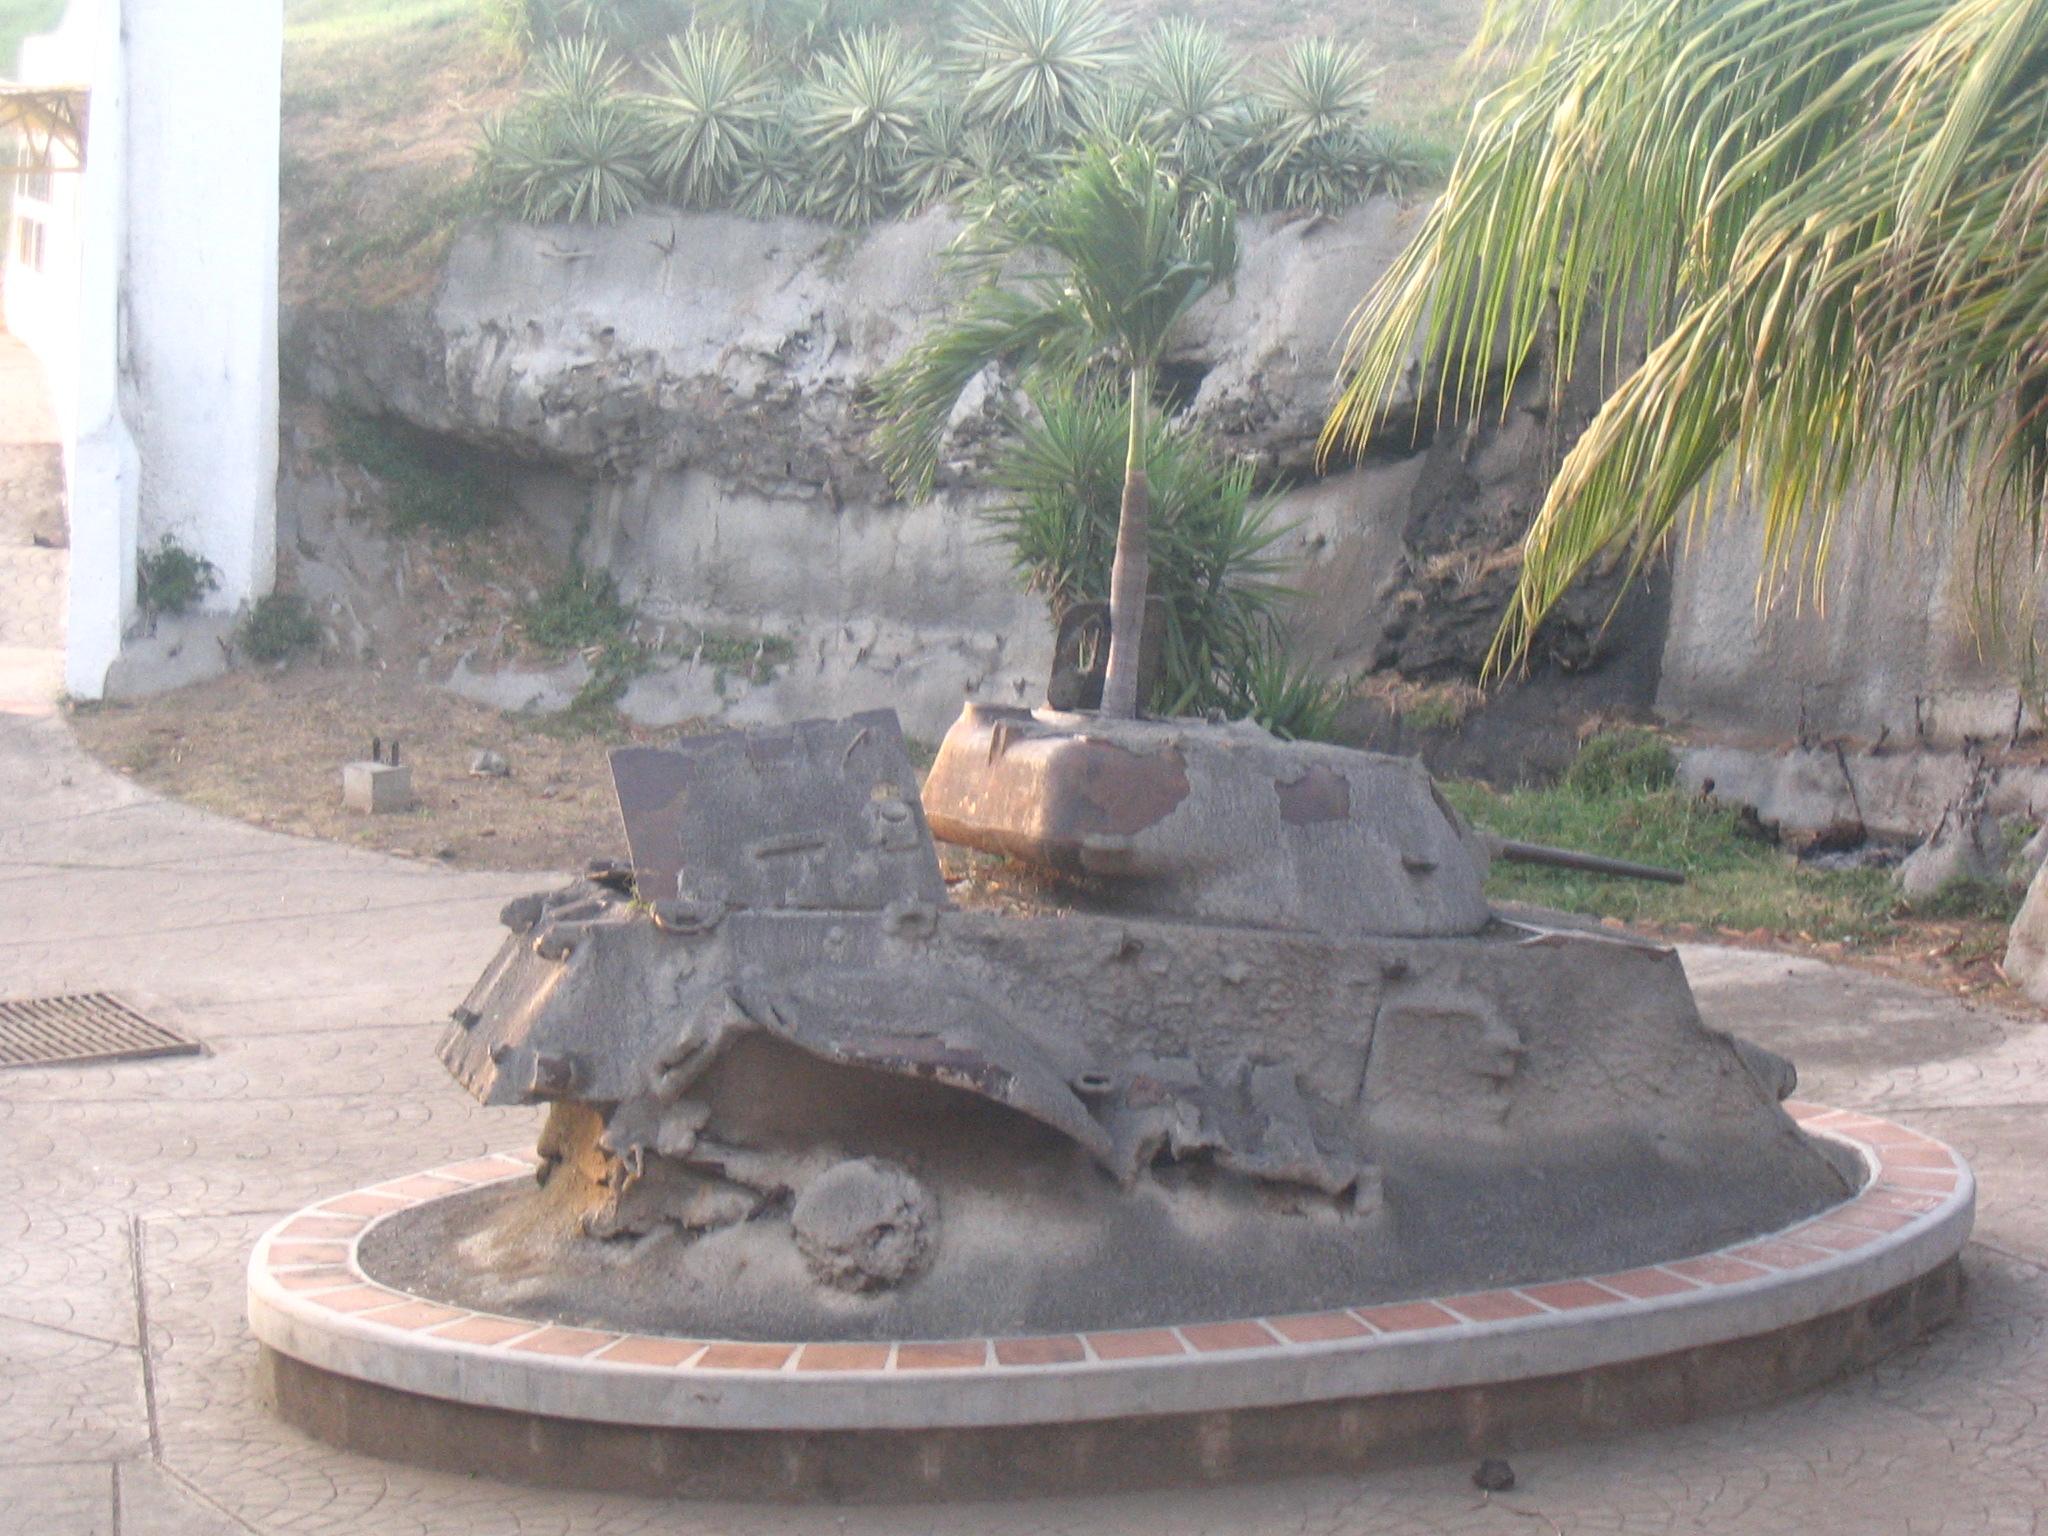 peace park tank krk.jpg